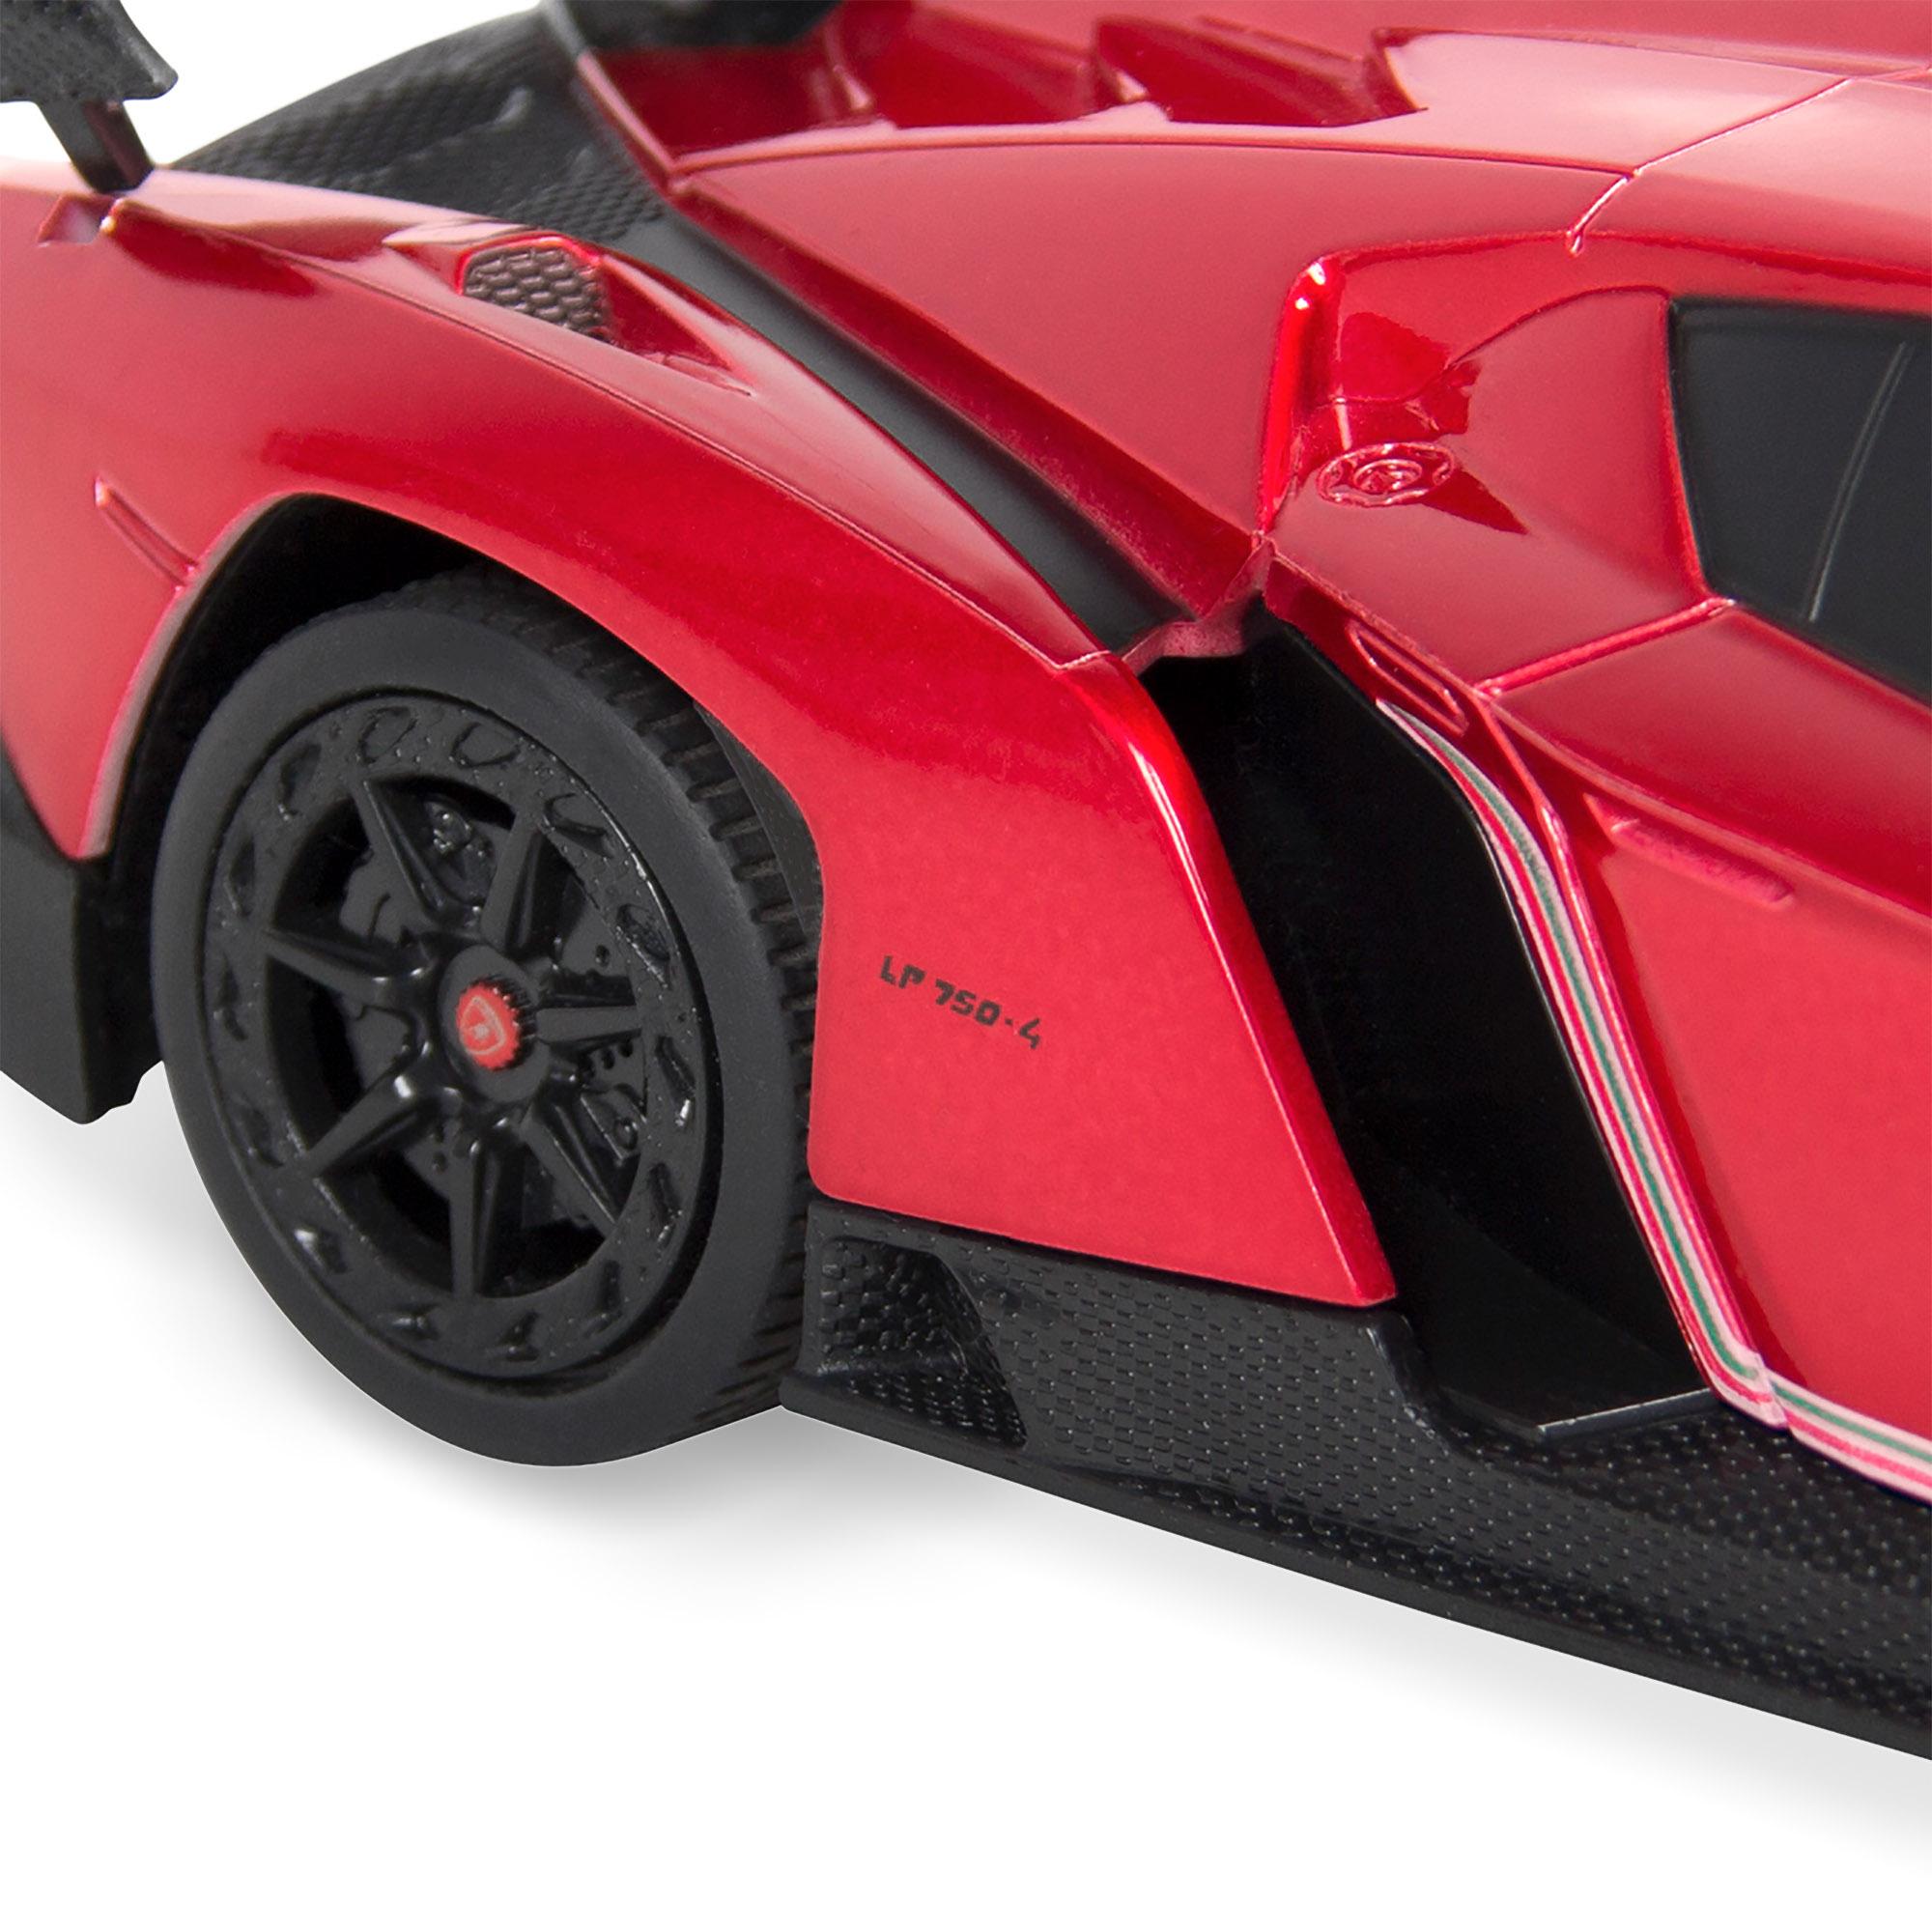 BCP-1-24-Kids-RC-Lamborghini-Veneno-Racing-Car-Toy-w-Lights-Shock-Suspension thumbnail 20